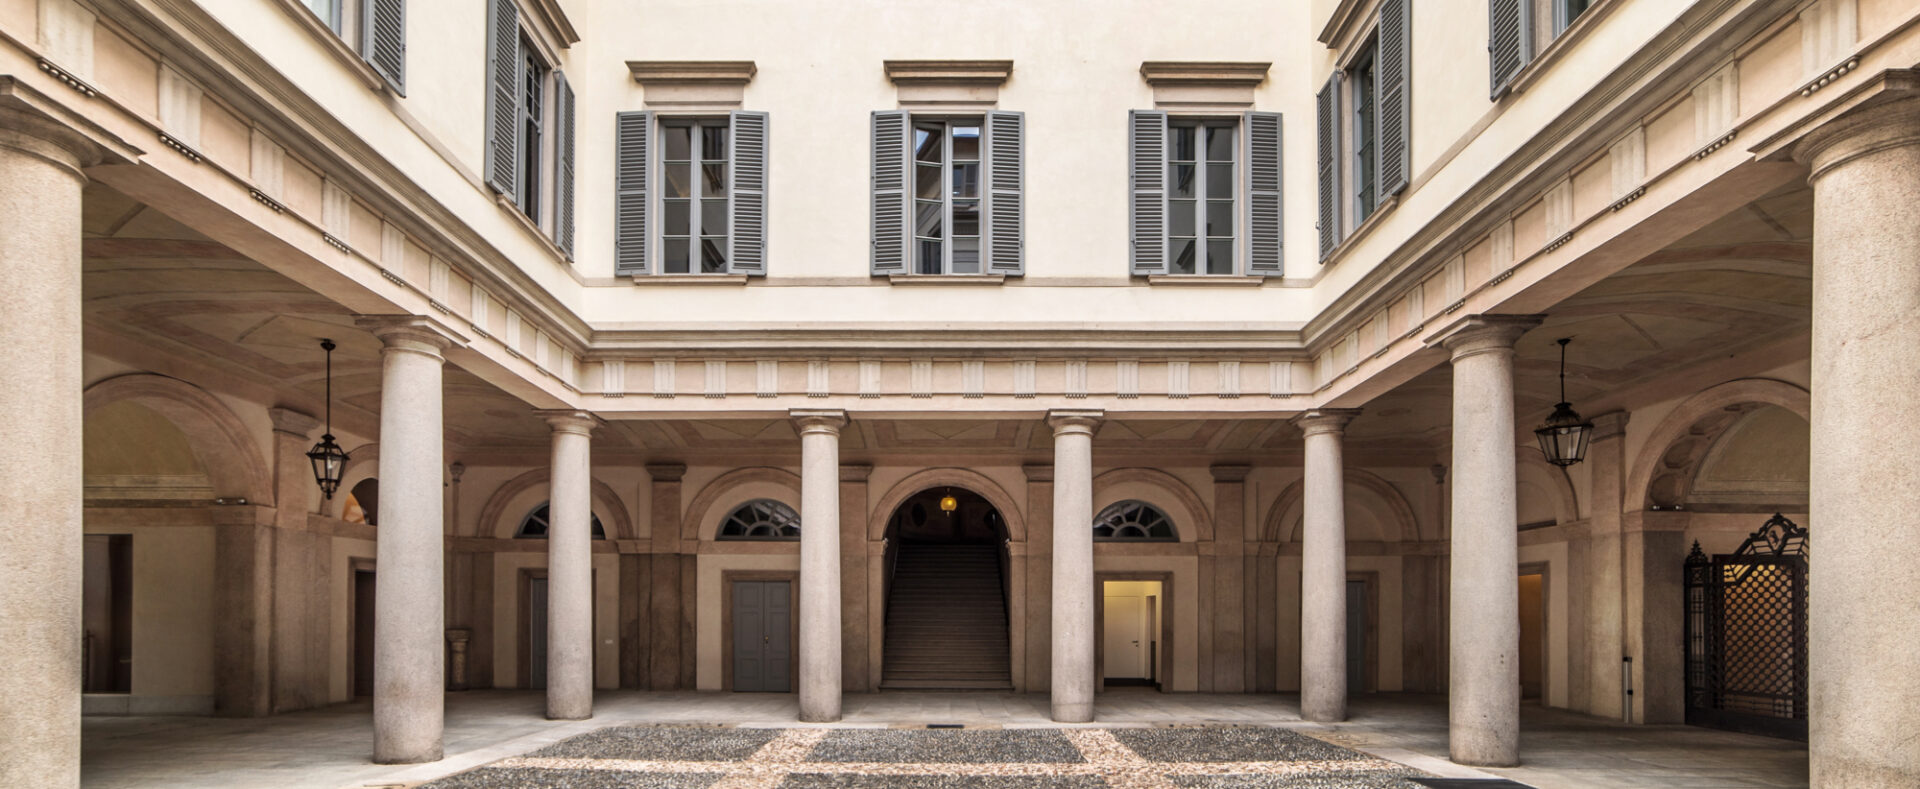 Cusani 5 Milano - Immobili Cittamoderna